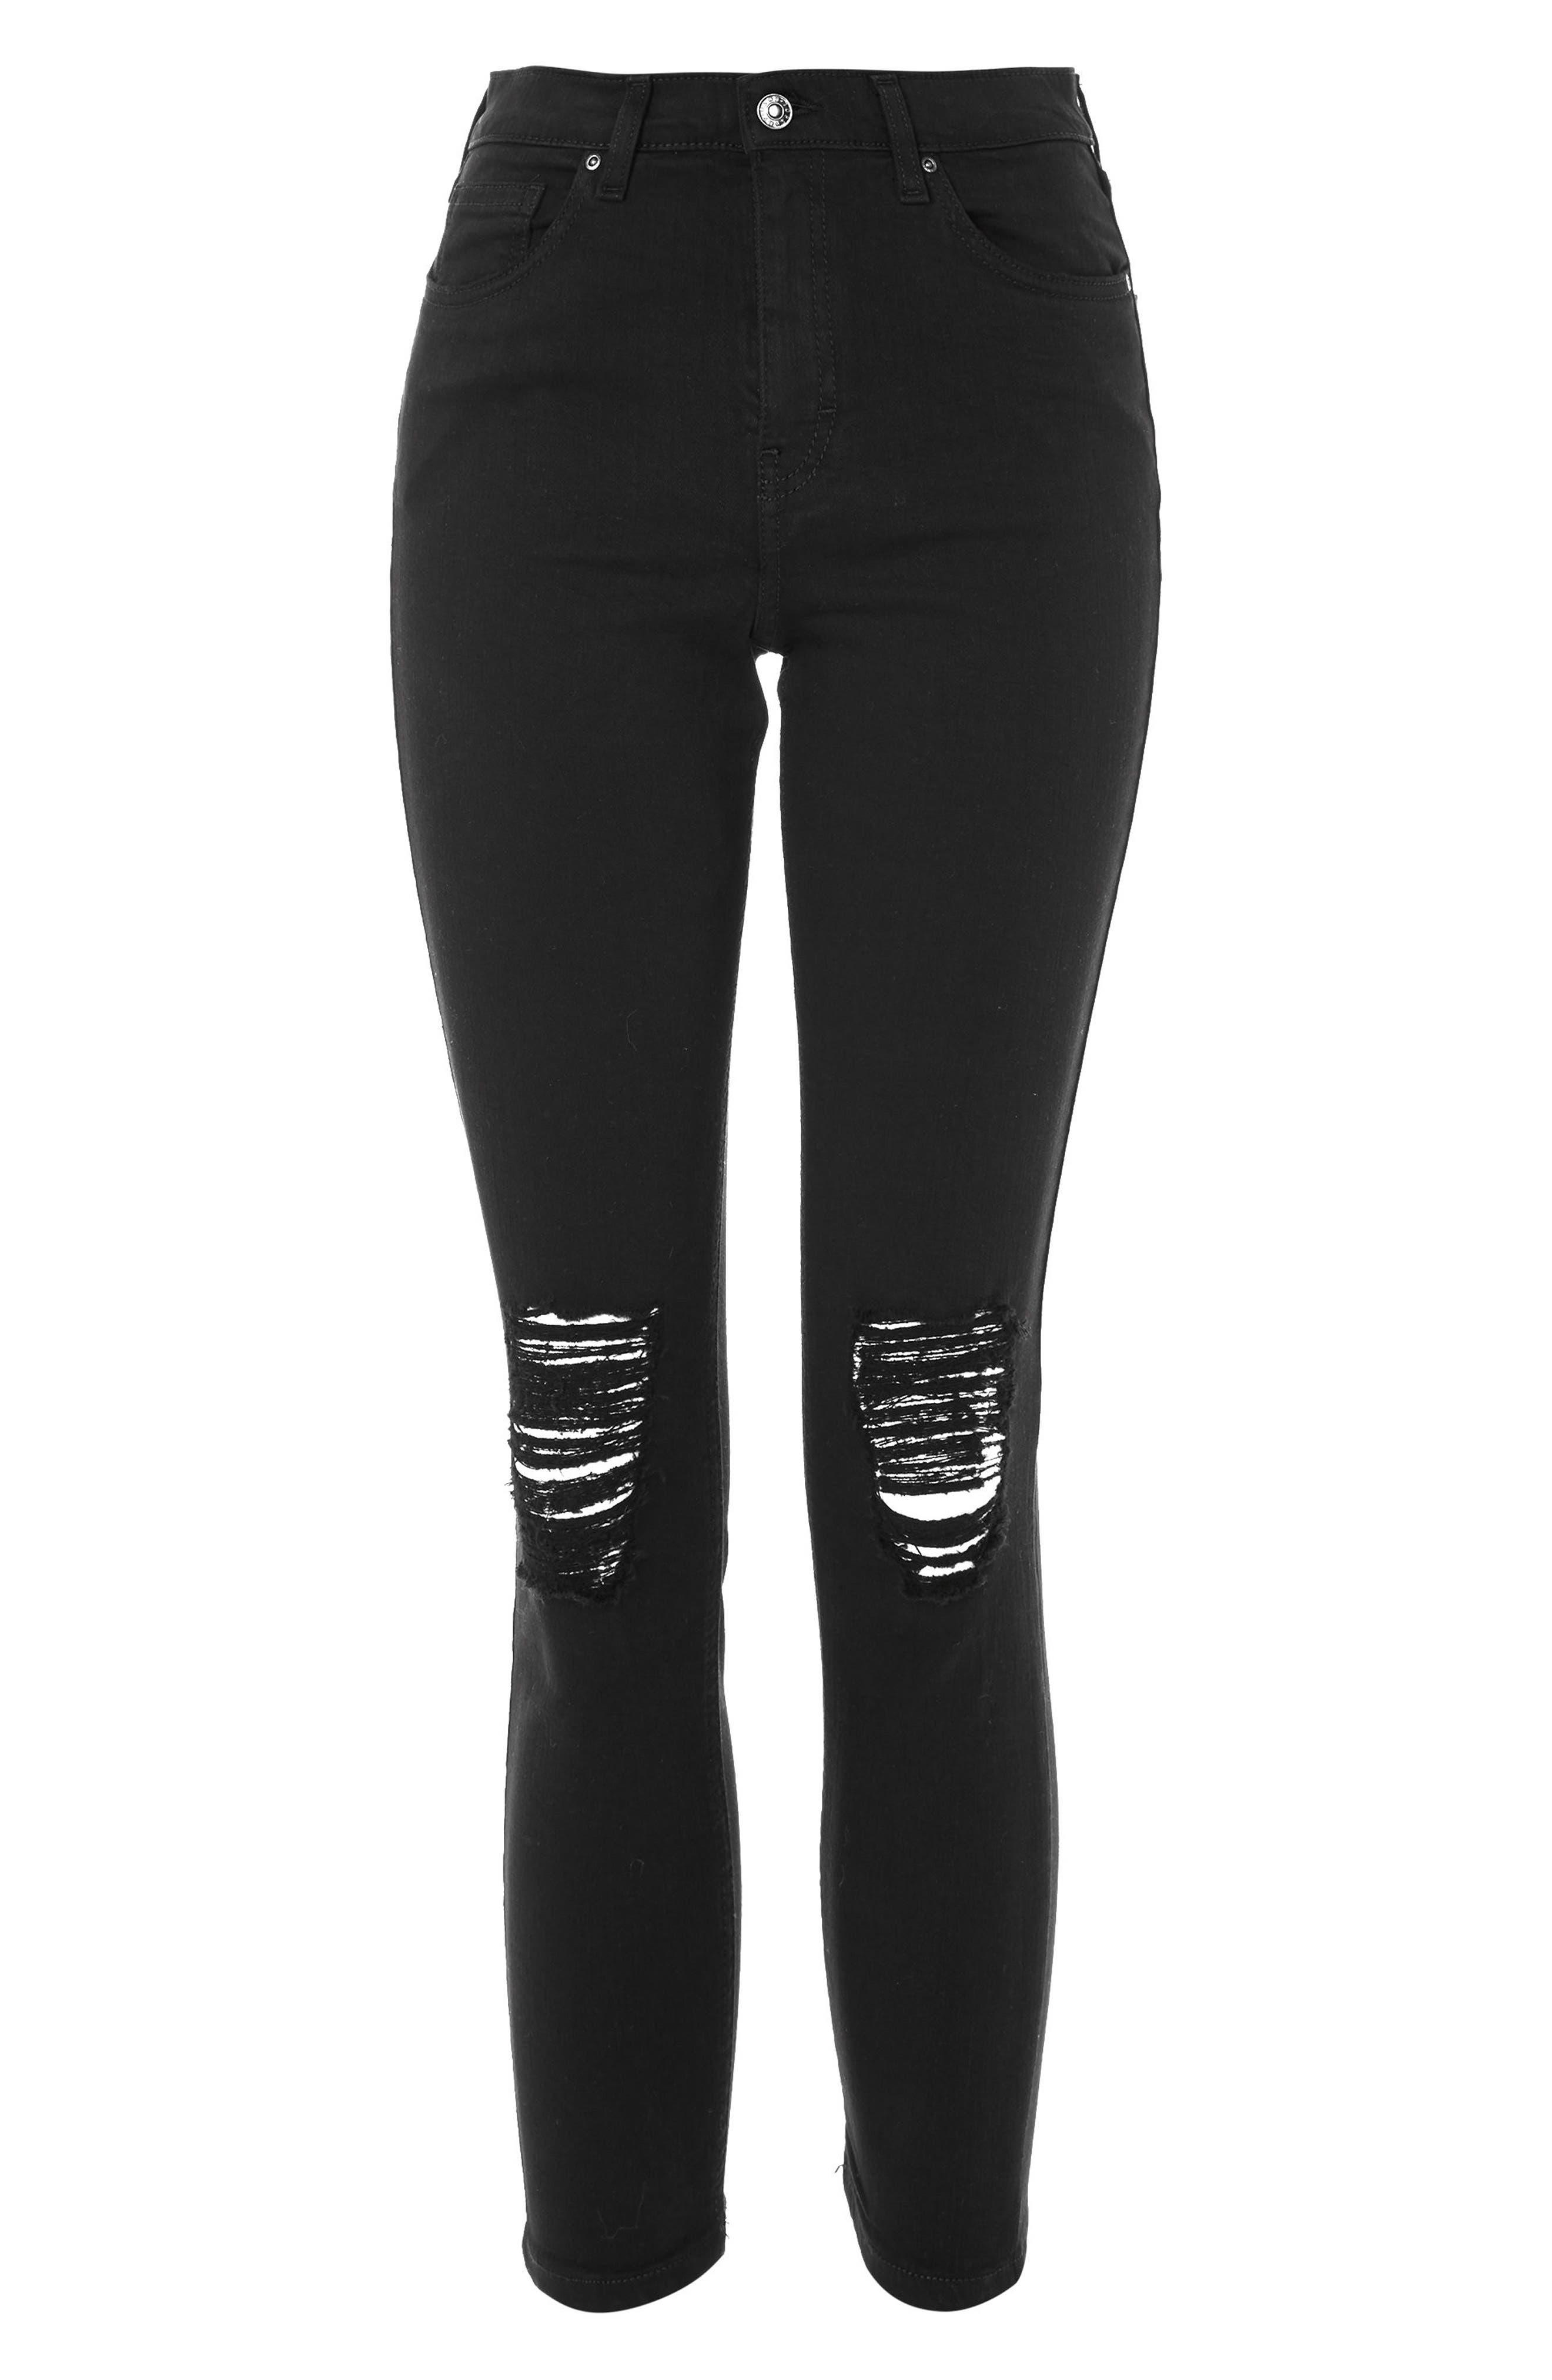 Ripped Petite Jamie Jeans,                             Alternate thumbnail 4, color,                             Black